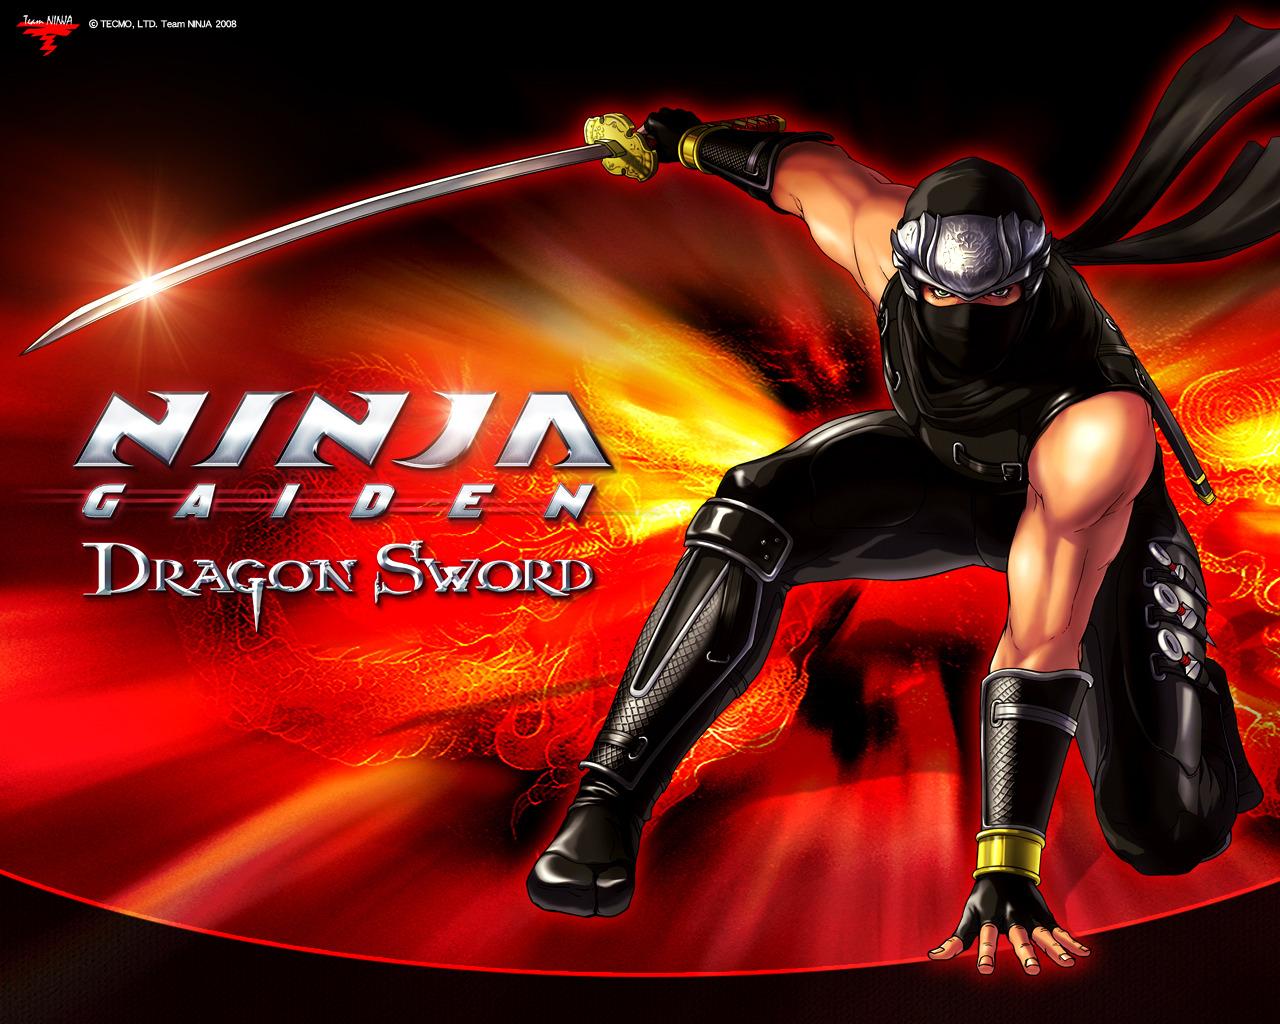 http://2.bp.blogspot.com/-bYdN6wJBAlI/Tmwh3Bt_oNI/AAAAAAAAEiM/TSB3XNyaKIM/s1600/Black+ninja+wallpapers+3.jpg